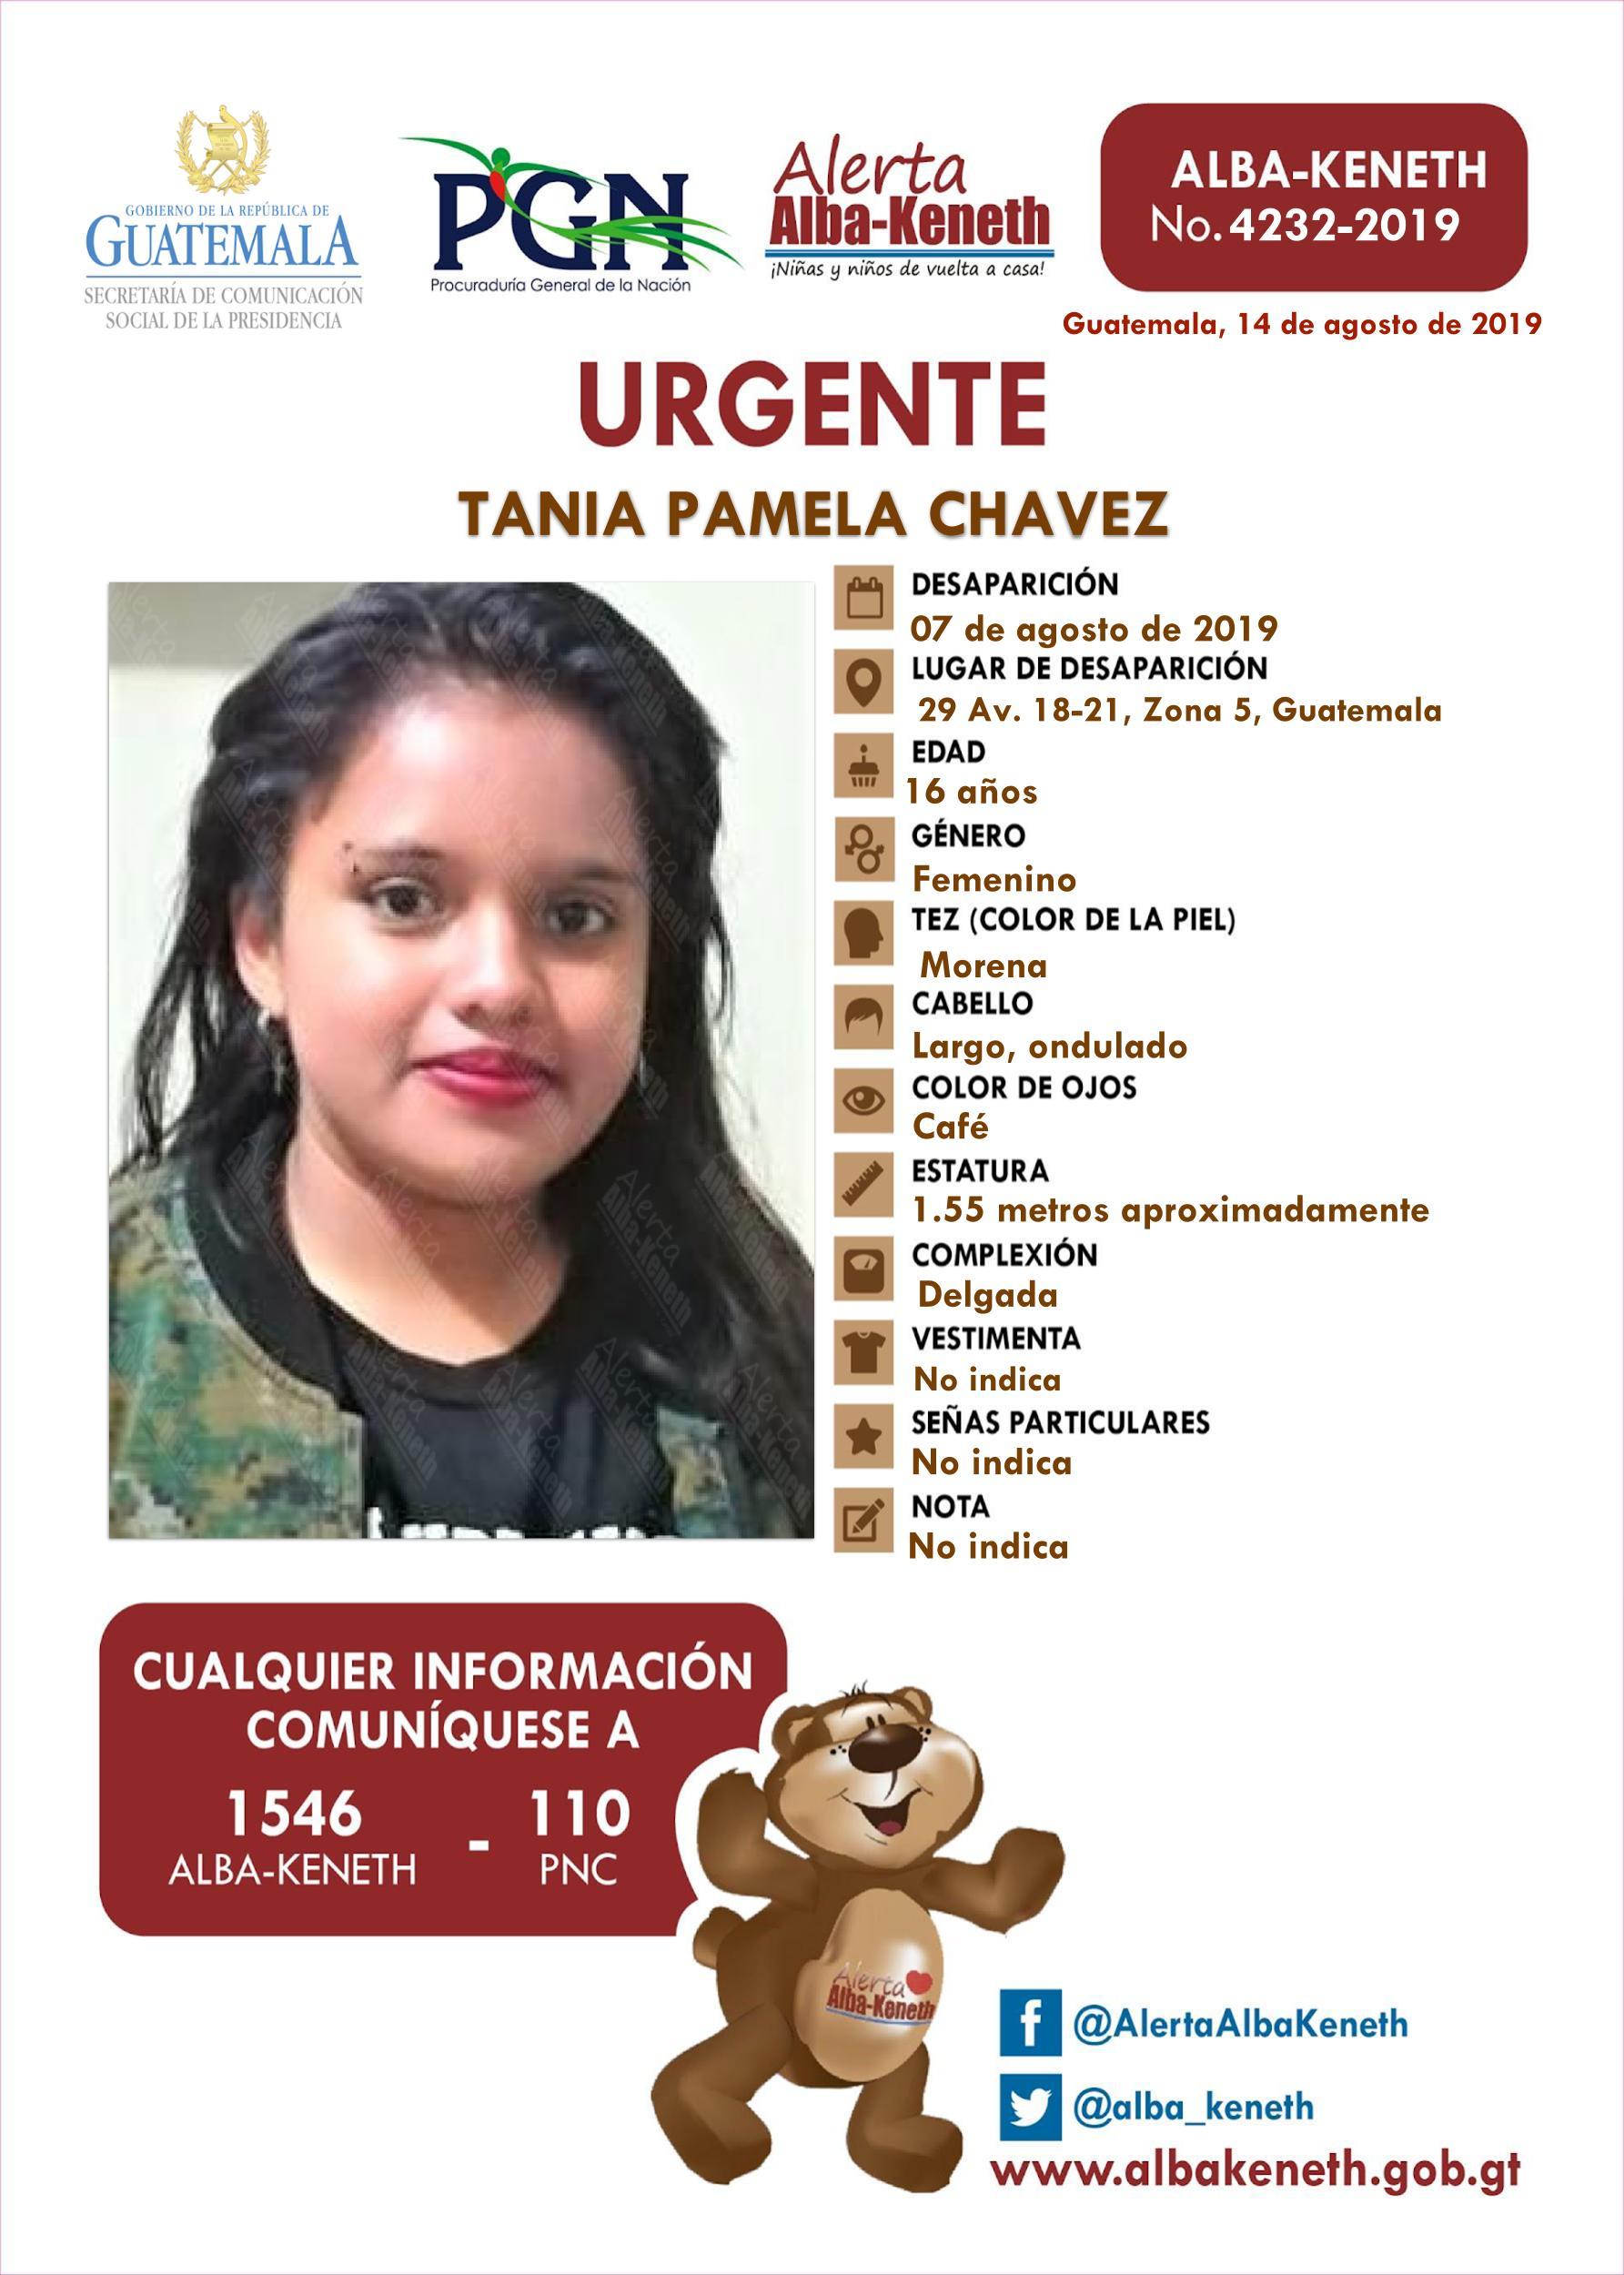 Tania Pamela Chavez